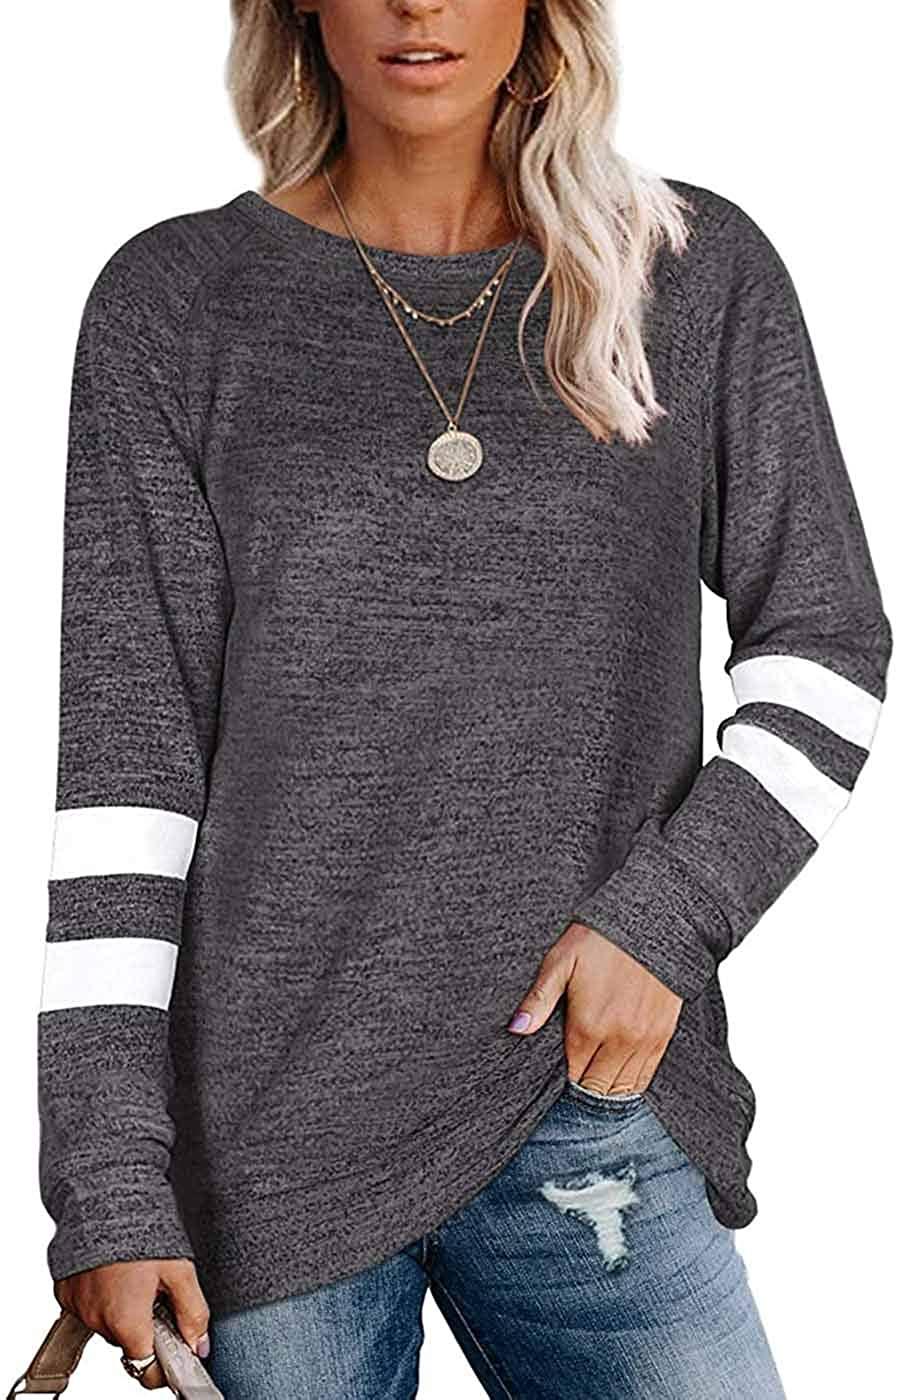 Reaowazo Womens Long Sleeve Tops Color Block Sweatshirts Sweaters Fall T Shirt Clothes